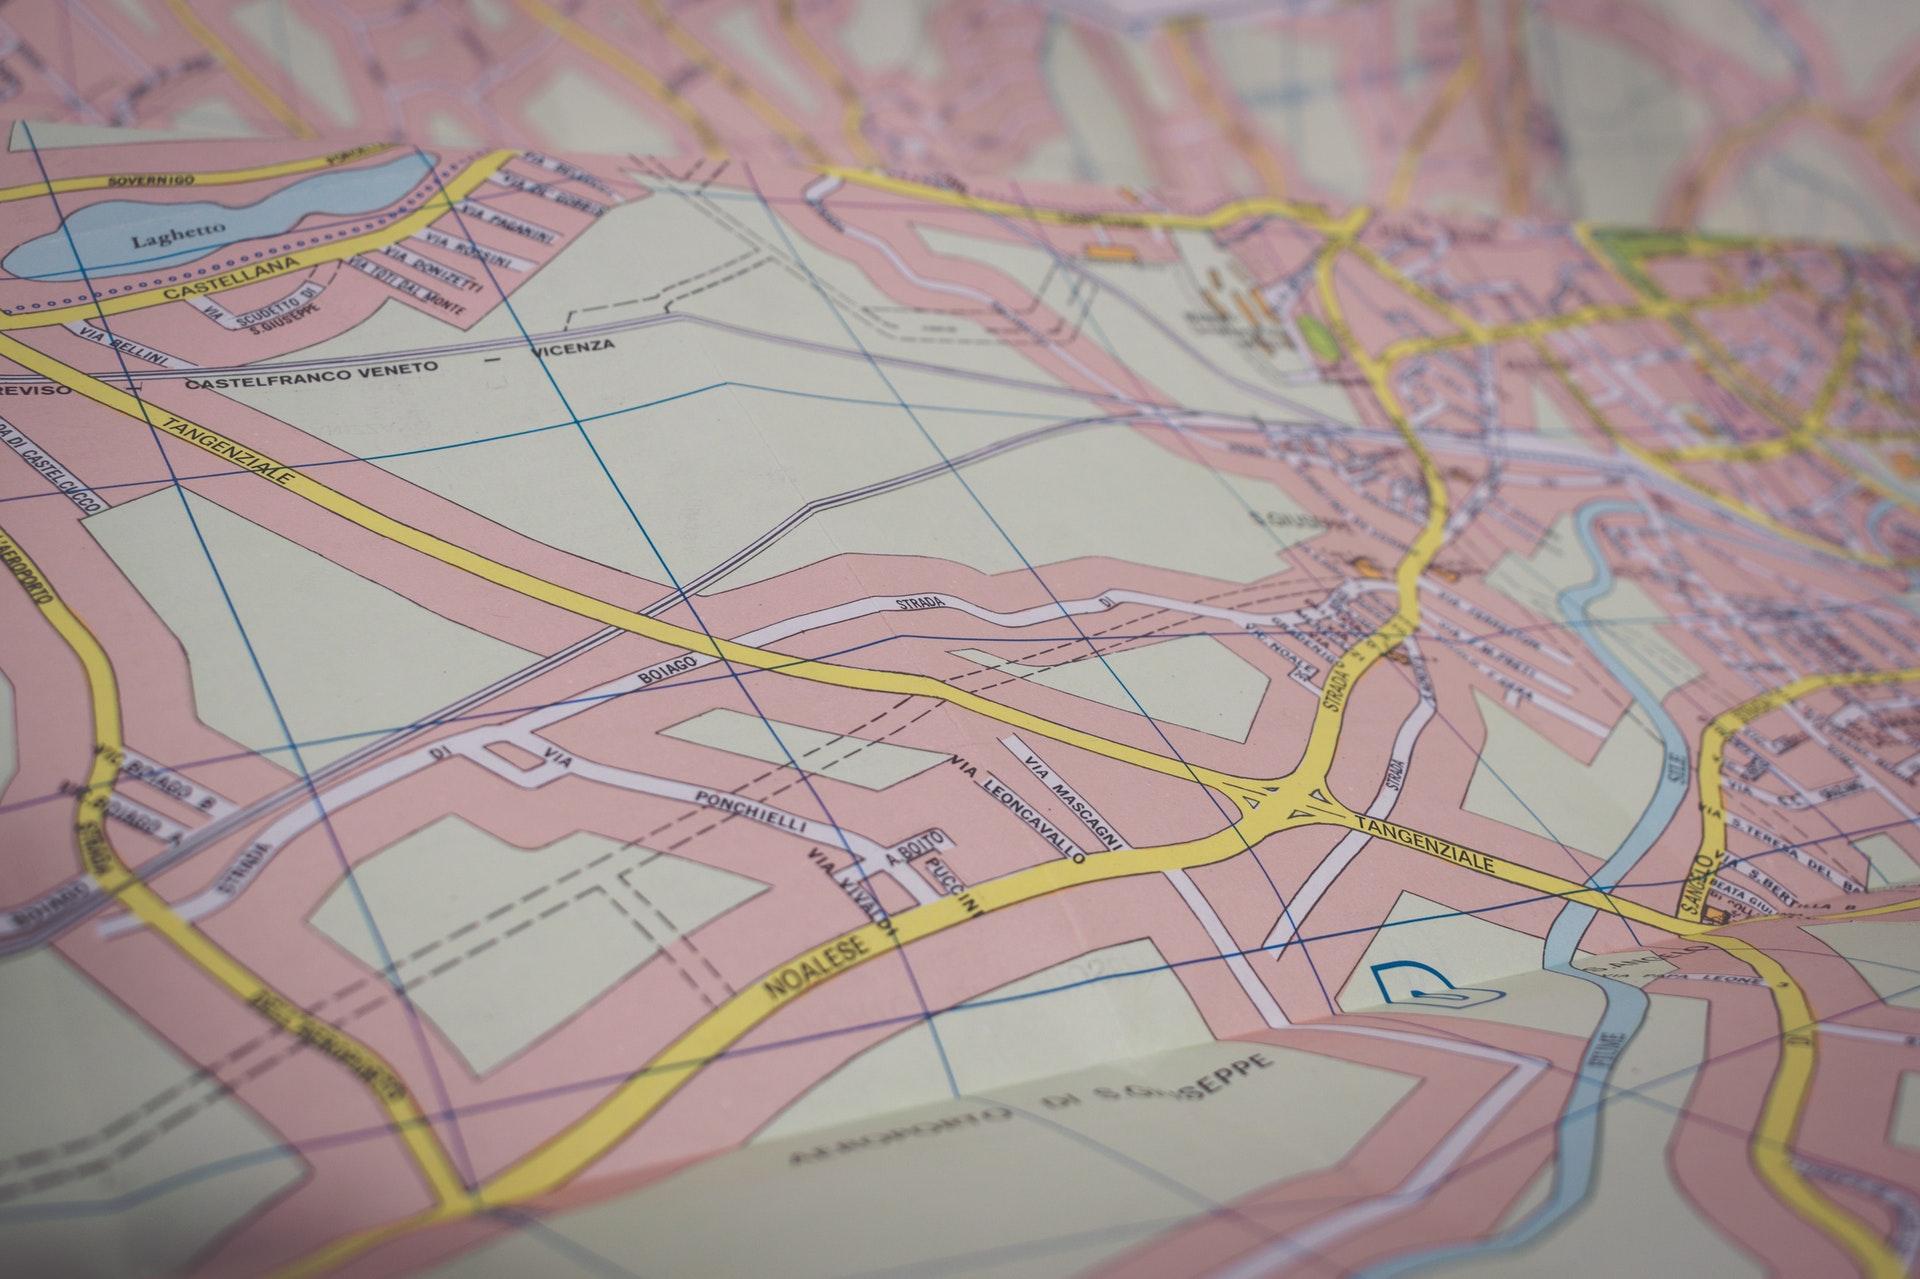 City map illustrating interoperability